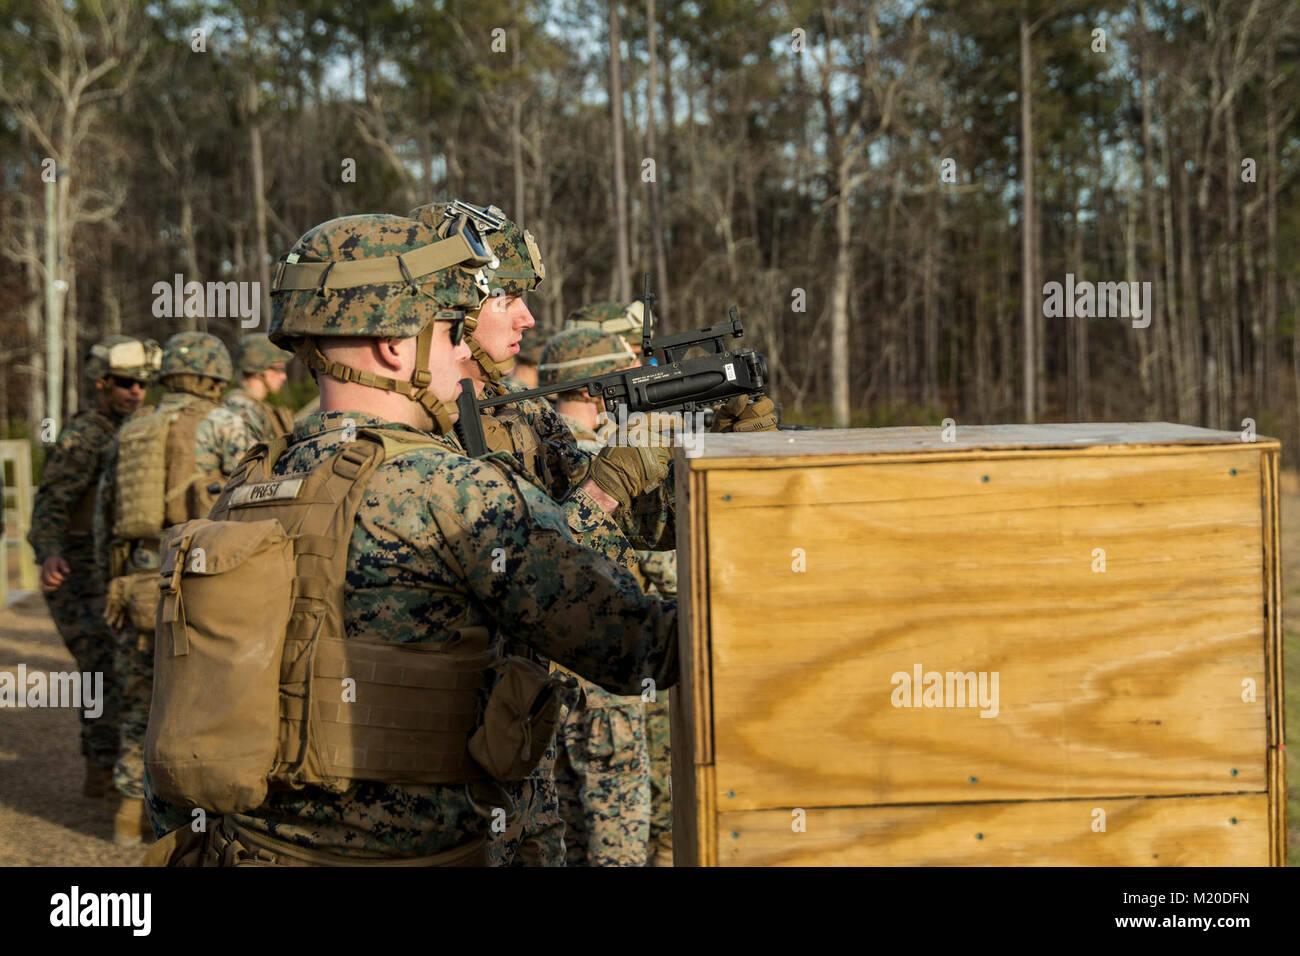 U.S. Marine Sgt. Sean A. O'Neill, center, a rifleman with Battalion Landing Team, 2nd Battalion, 6th Marine Regiment, - Stock Image